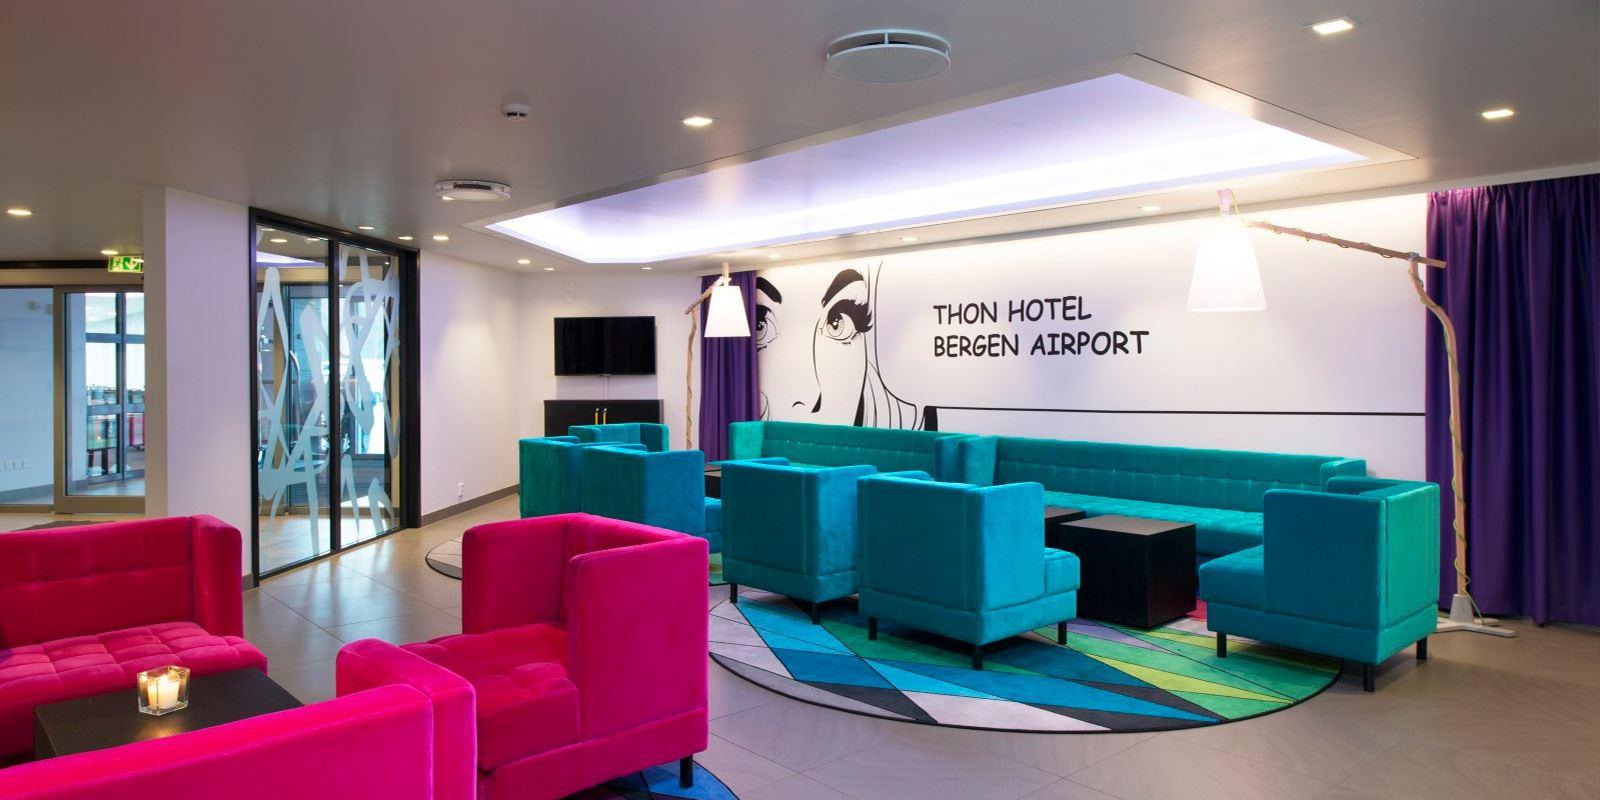 thon-hotel-bergen-airport-lobby